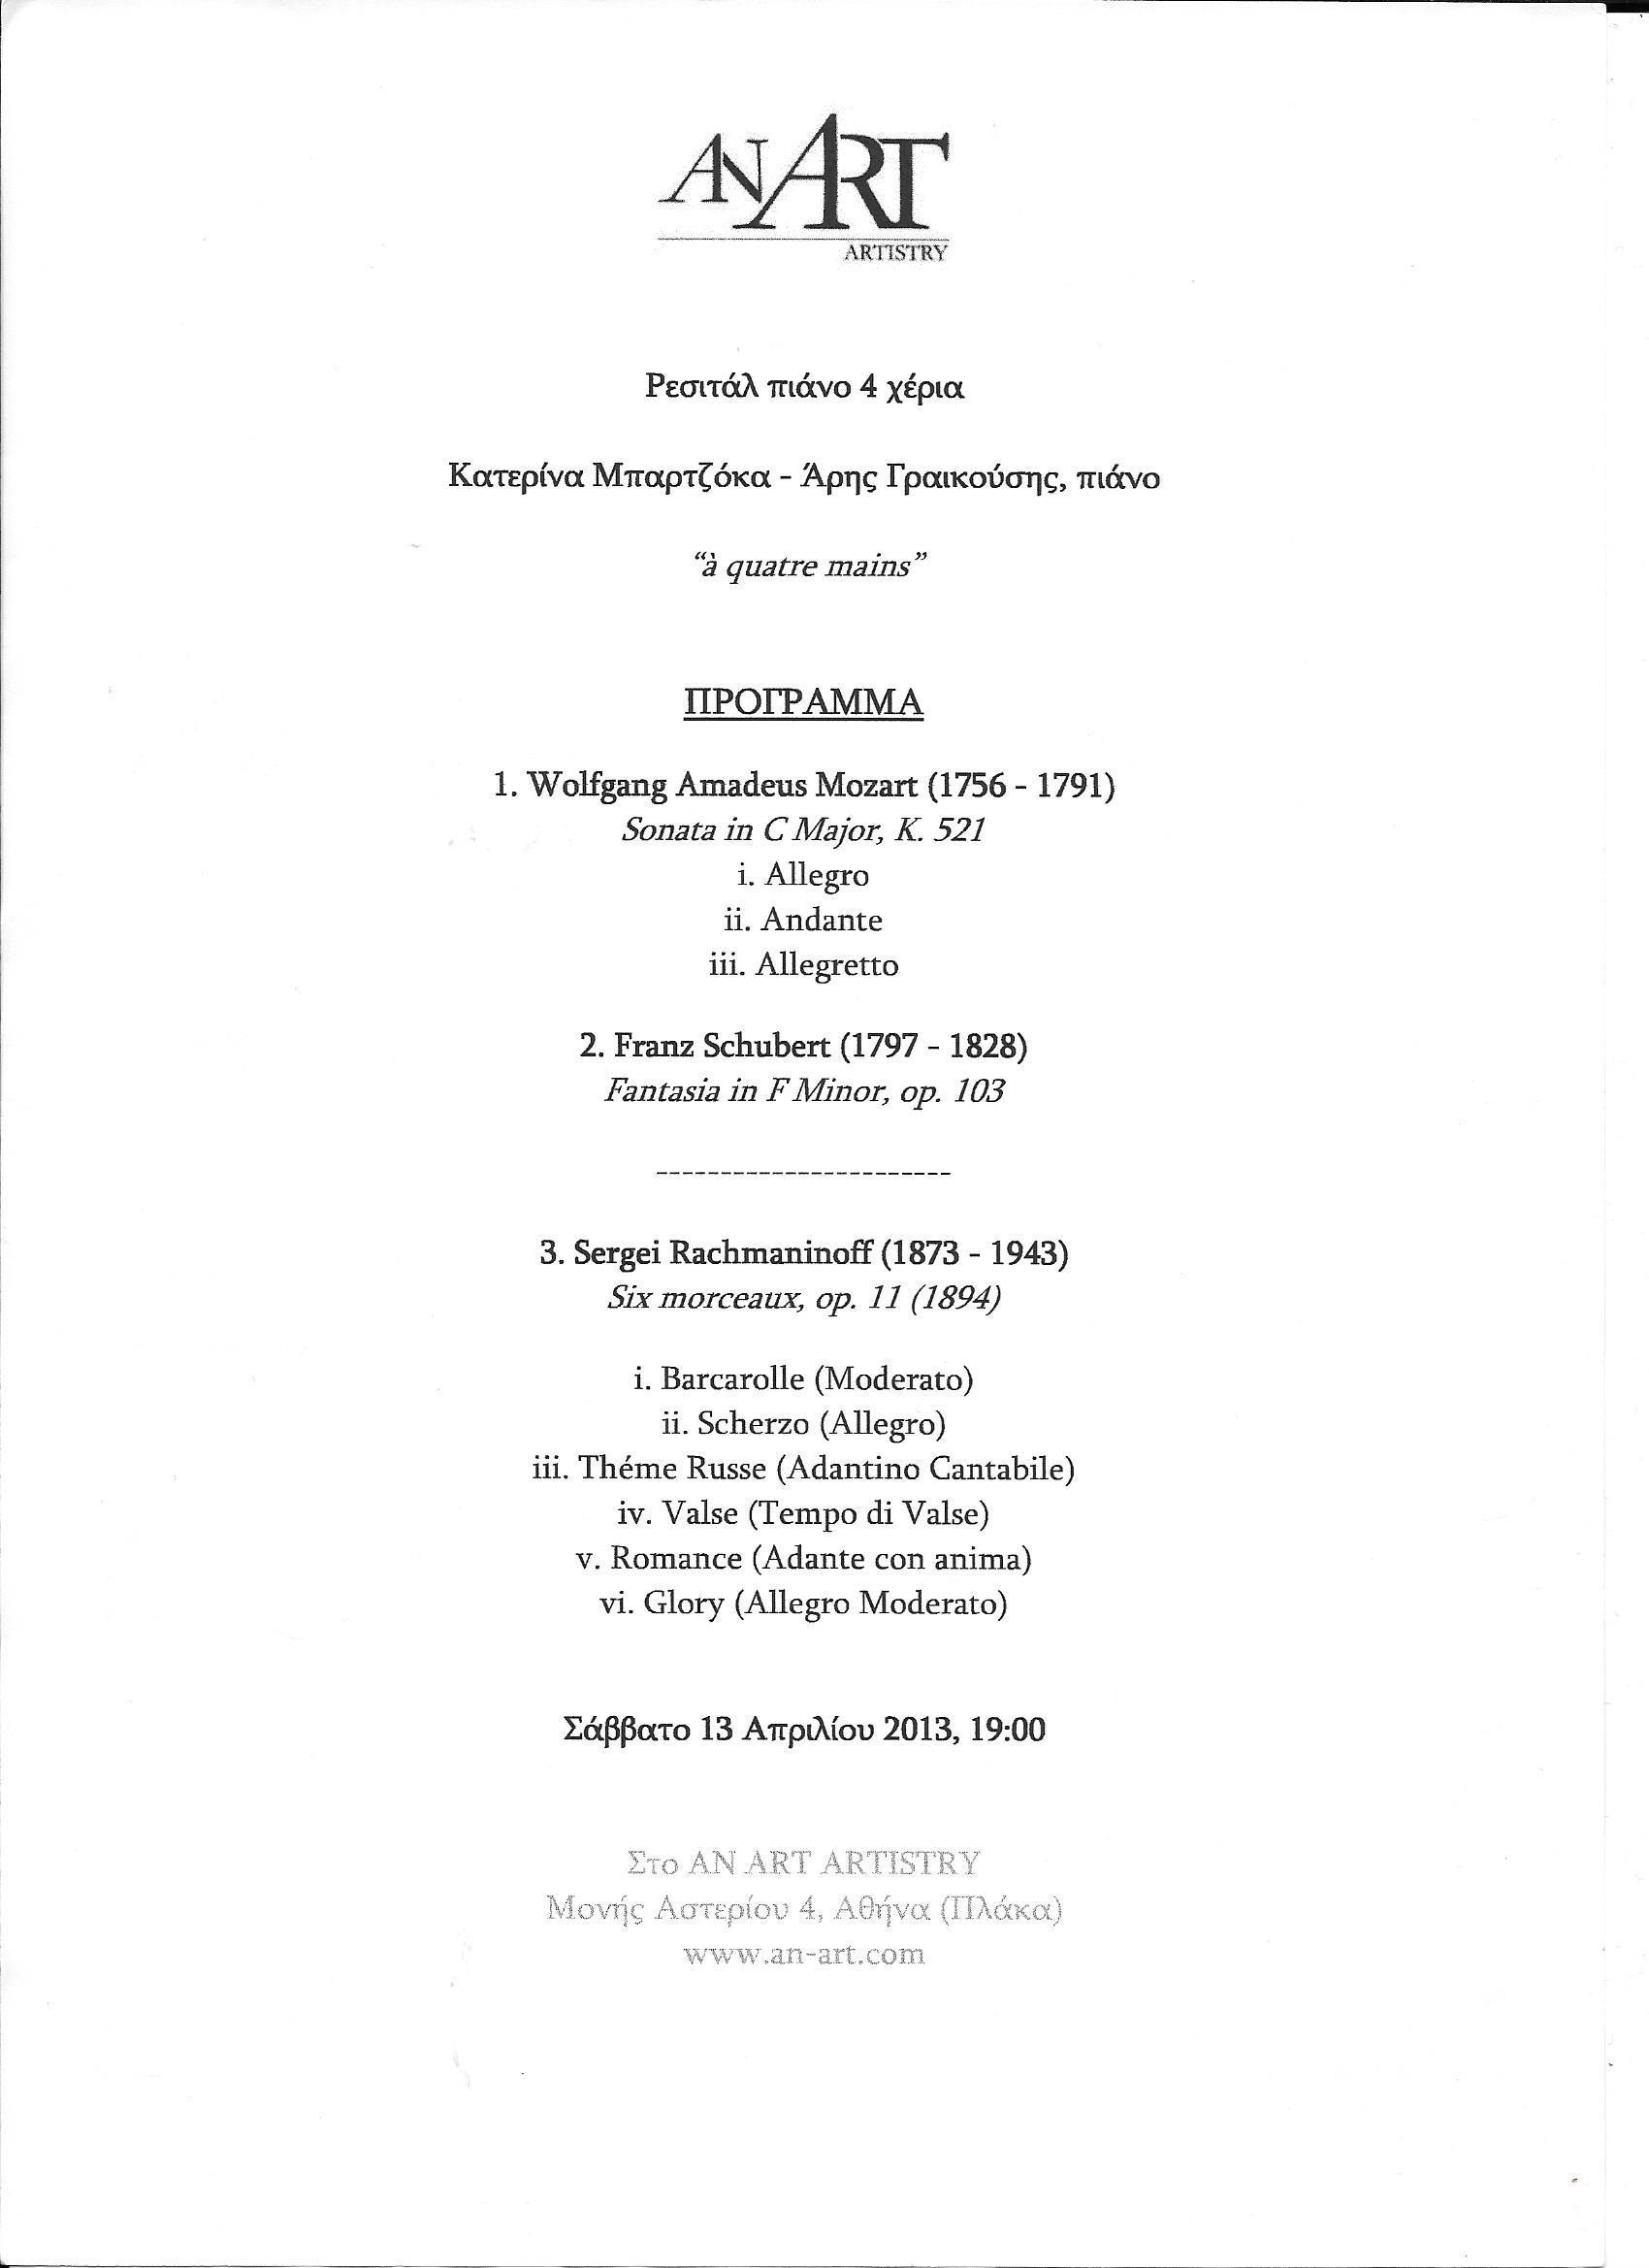 A quatre mains. Κατερίνα Μπαριζόκα και Άρης Γραικούσης σε έργα των Mozart, Schubert, Rachmaninoff.